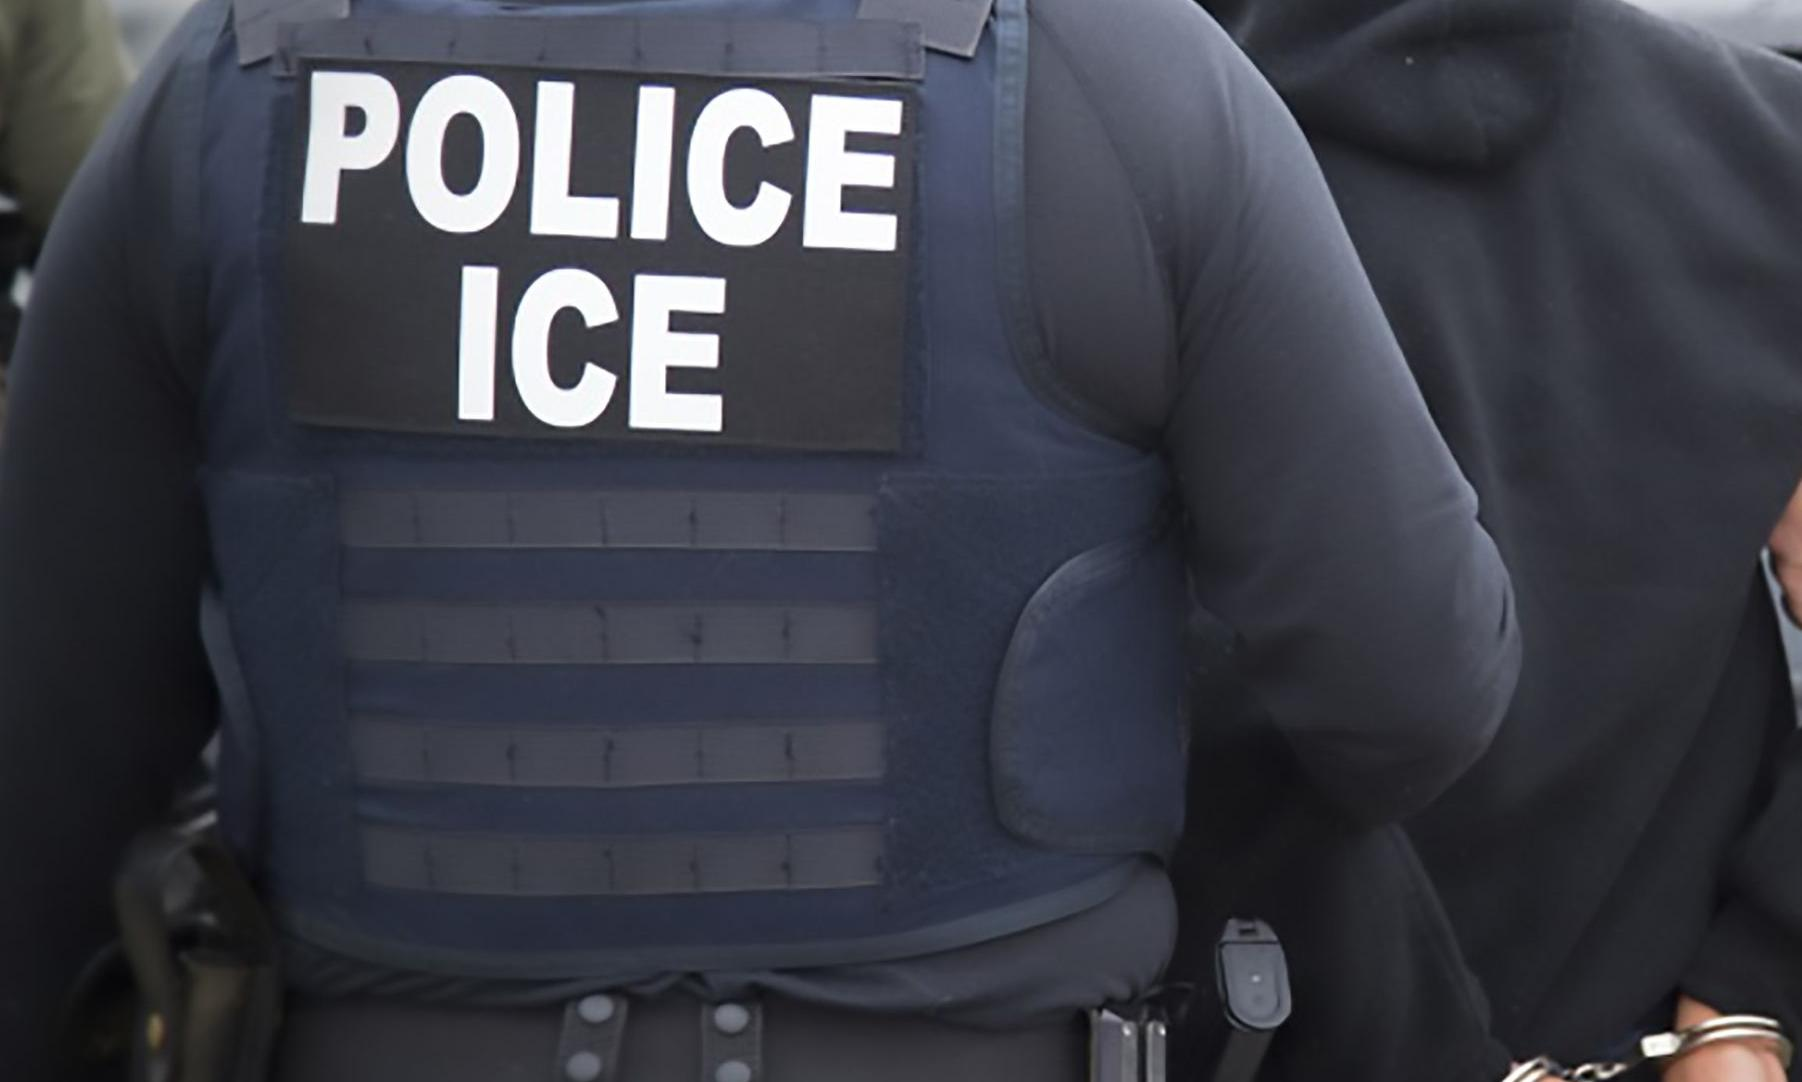 Canadian deported despite having served for US military